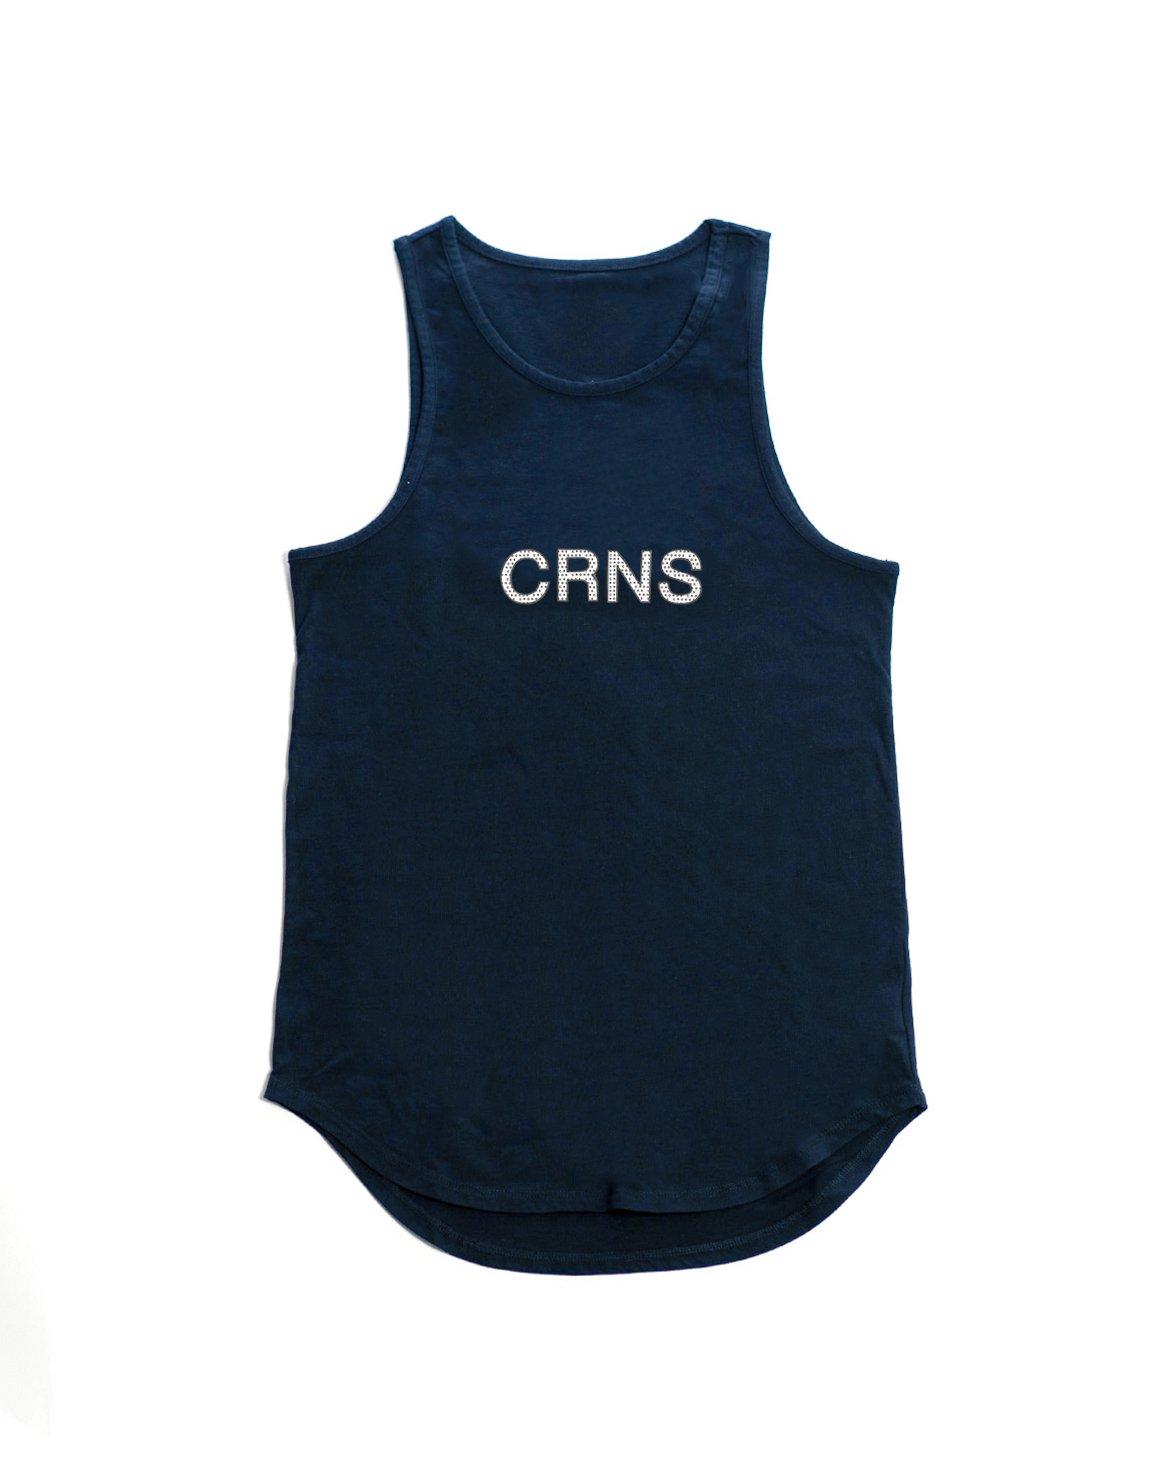 <img class='new_mark_img1' src='https://img.shop-pro.jp/img/new/icons1.gif' style='border:none;display:inline;margin:0px;padding:0px;width:auto;' />CRNS DOT LOGO TANKTOP【NAVY】